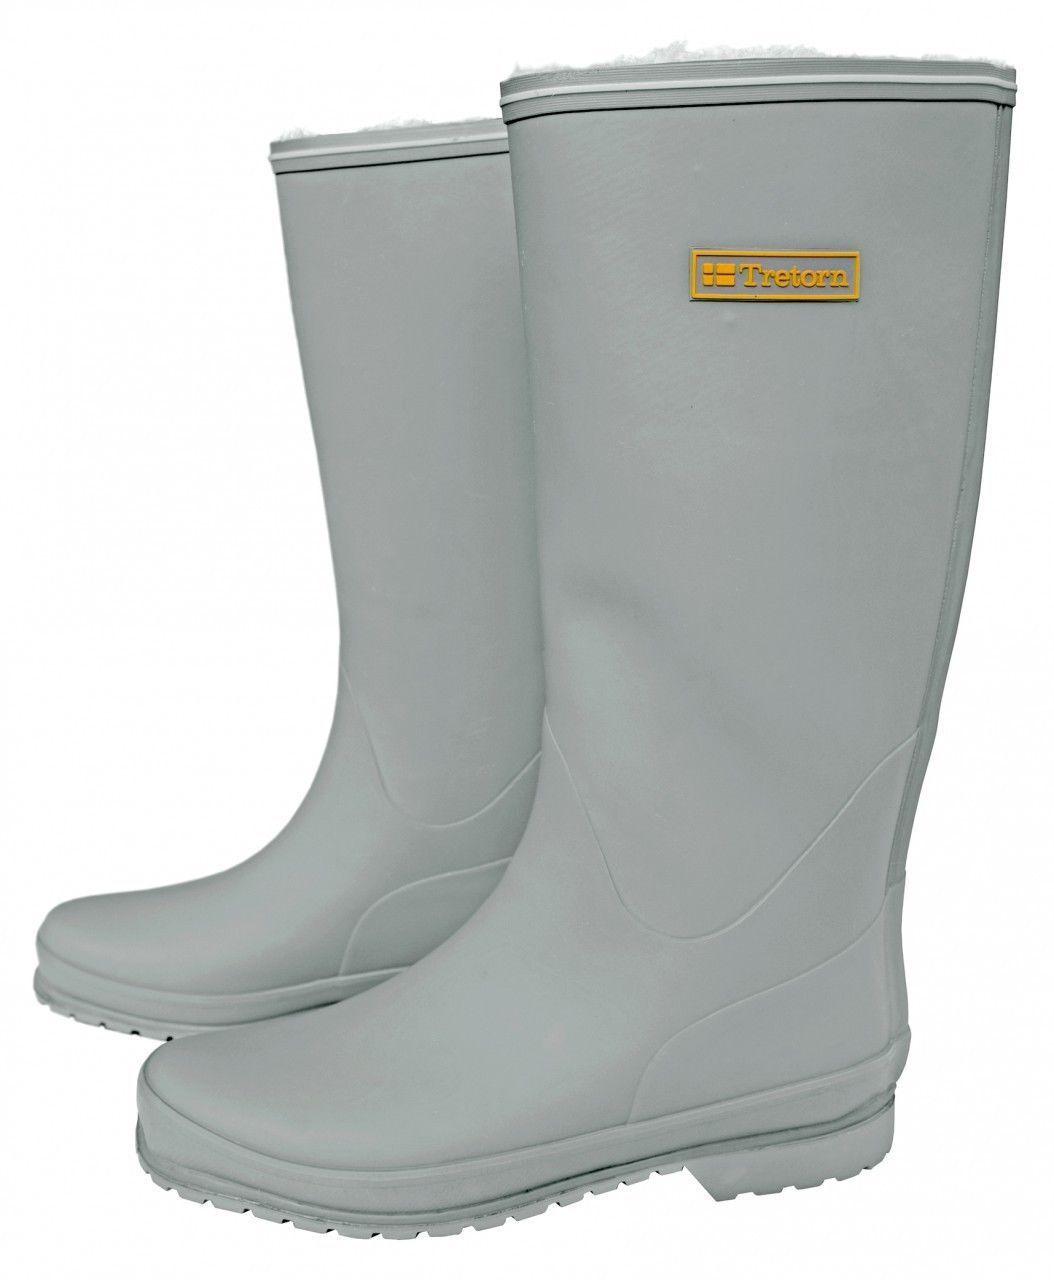 Top 10 Rain Boots for Women | eBay